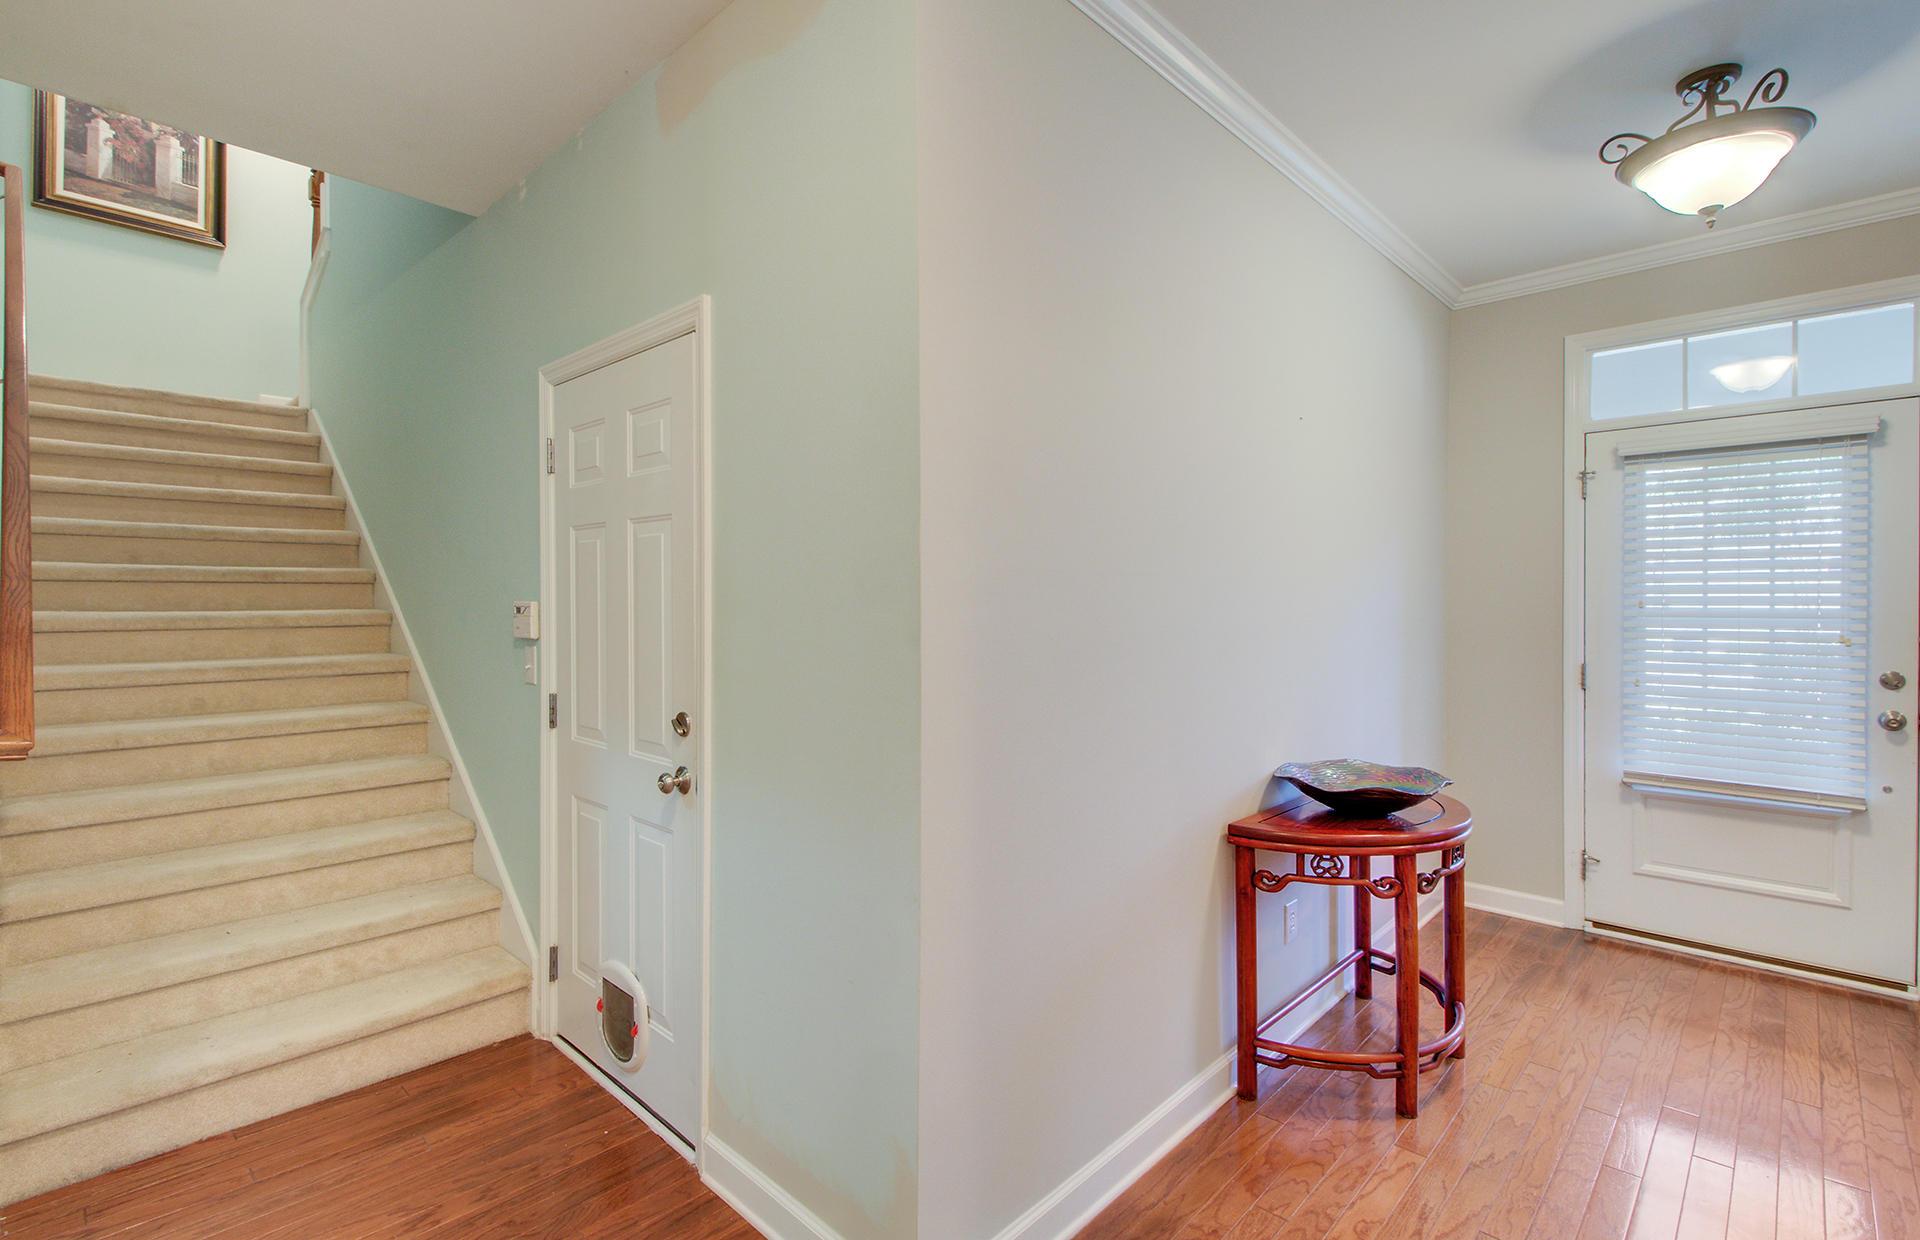 Dunes West Homes For Sale - 145 Fresh Meadow, Mount Pleasant, SC - 25